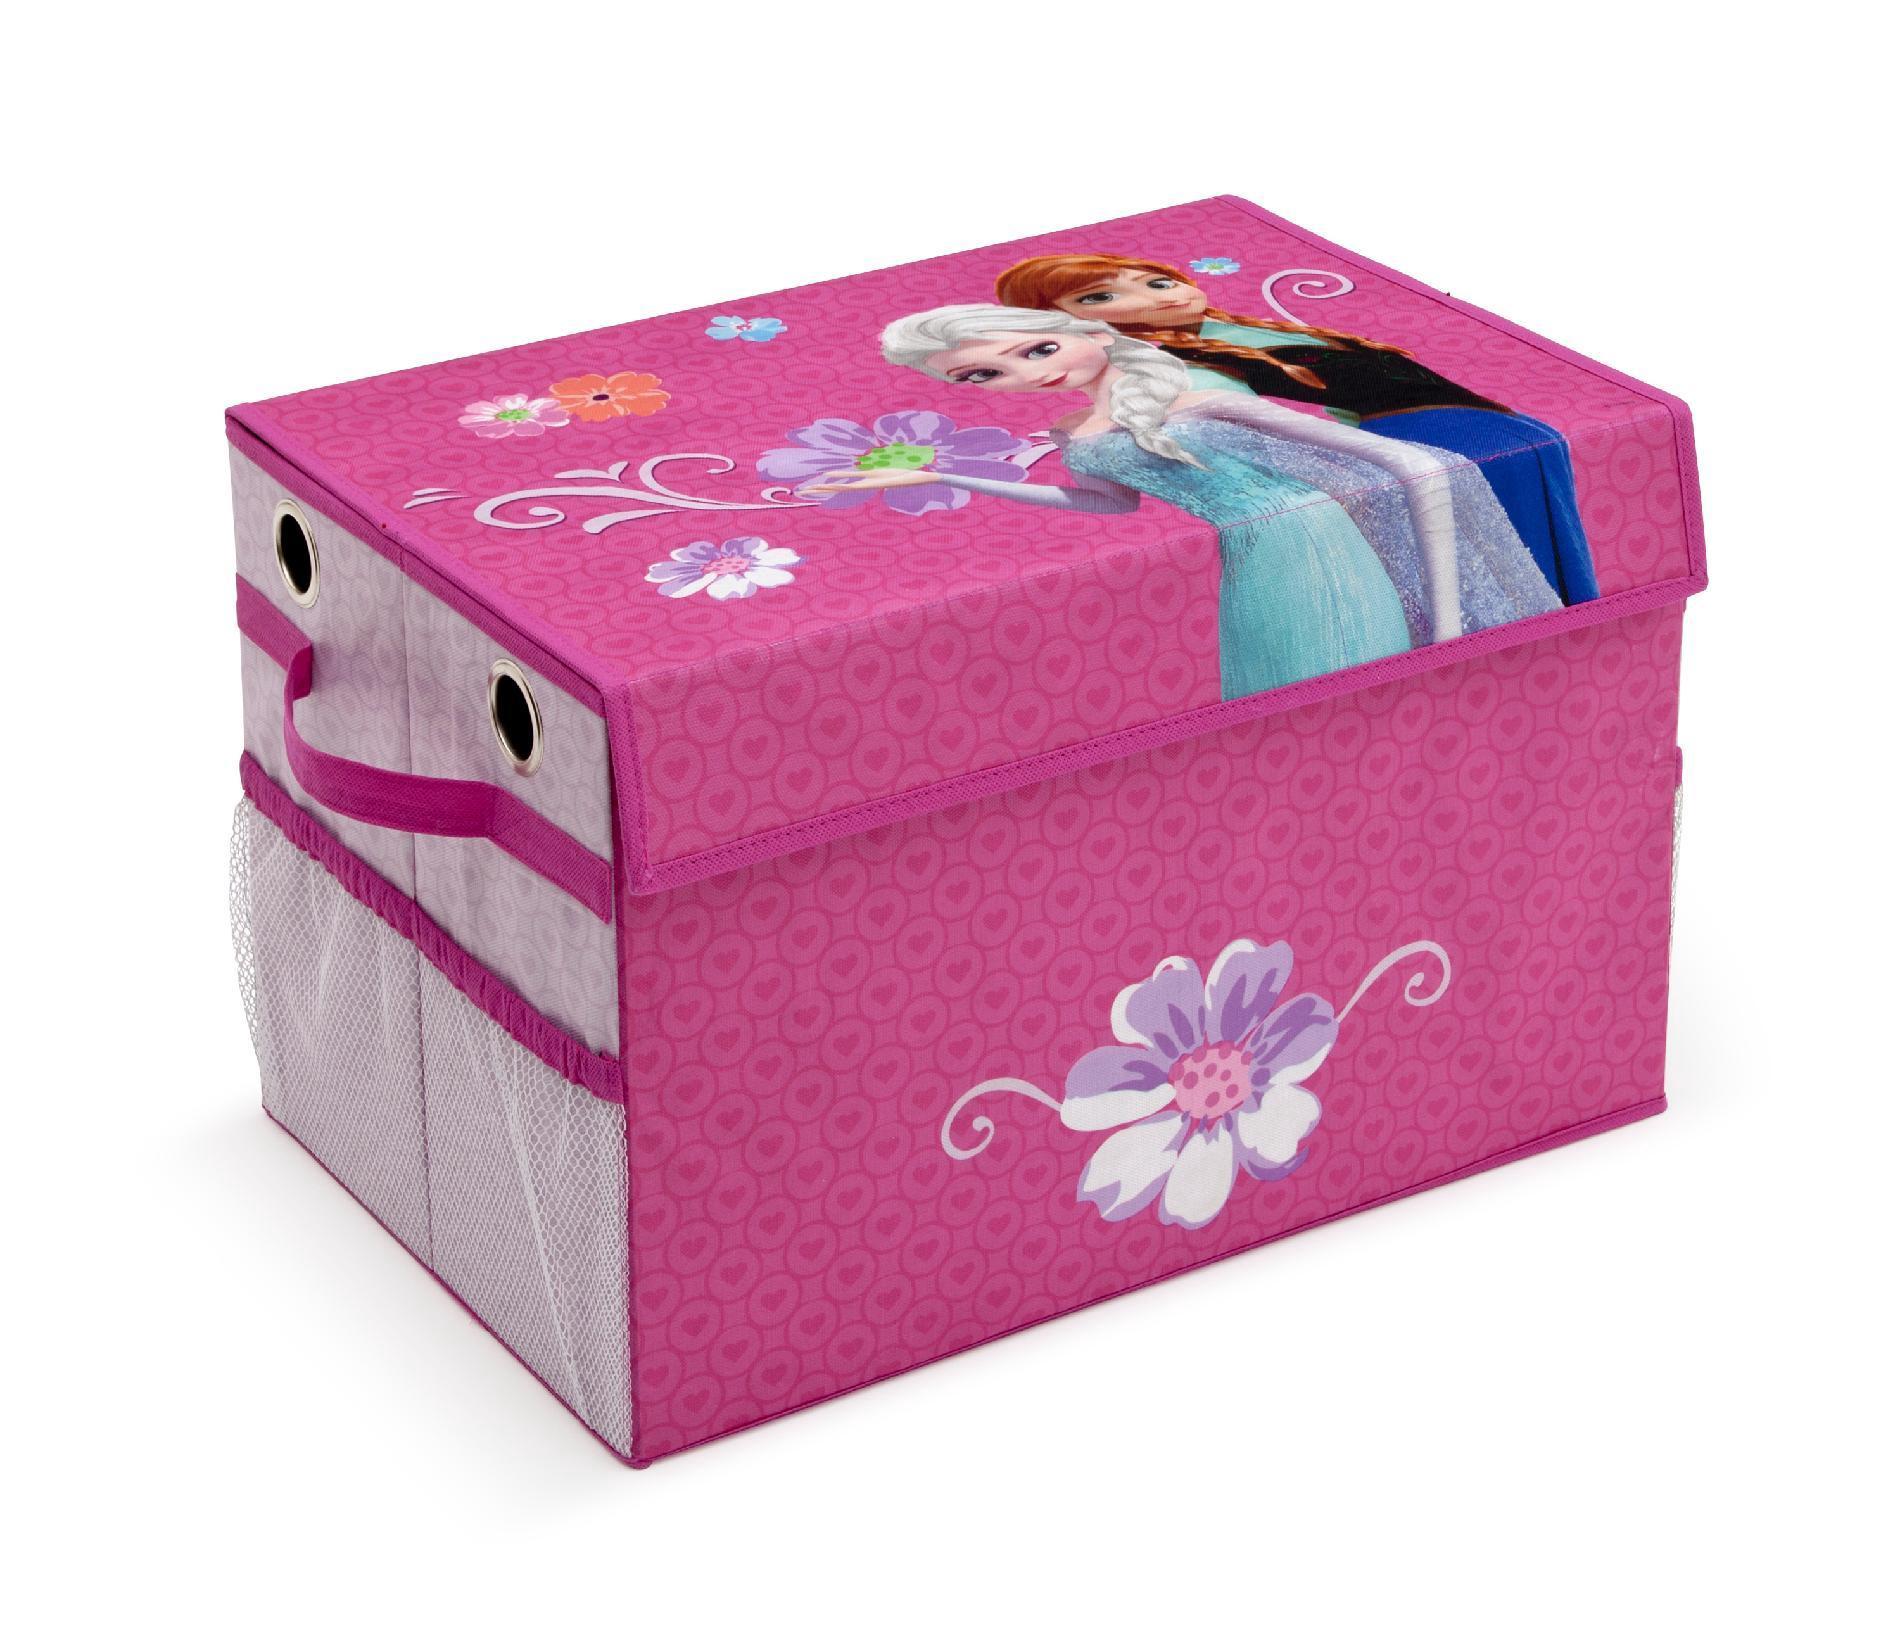 FROZEN FABRIC TOY BOX